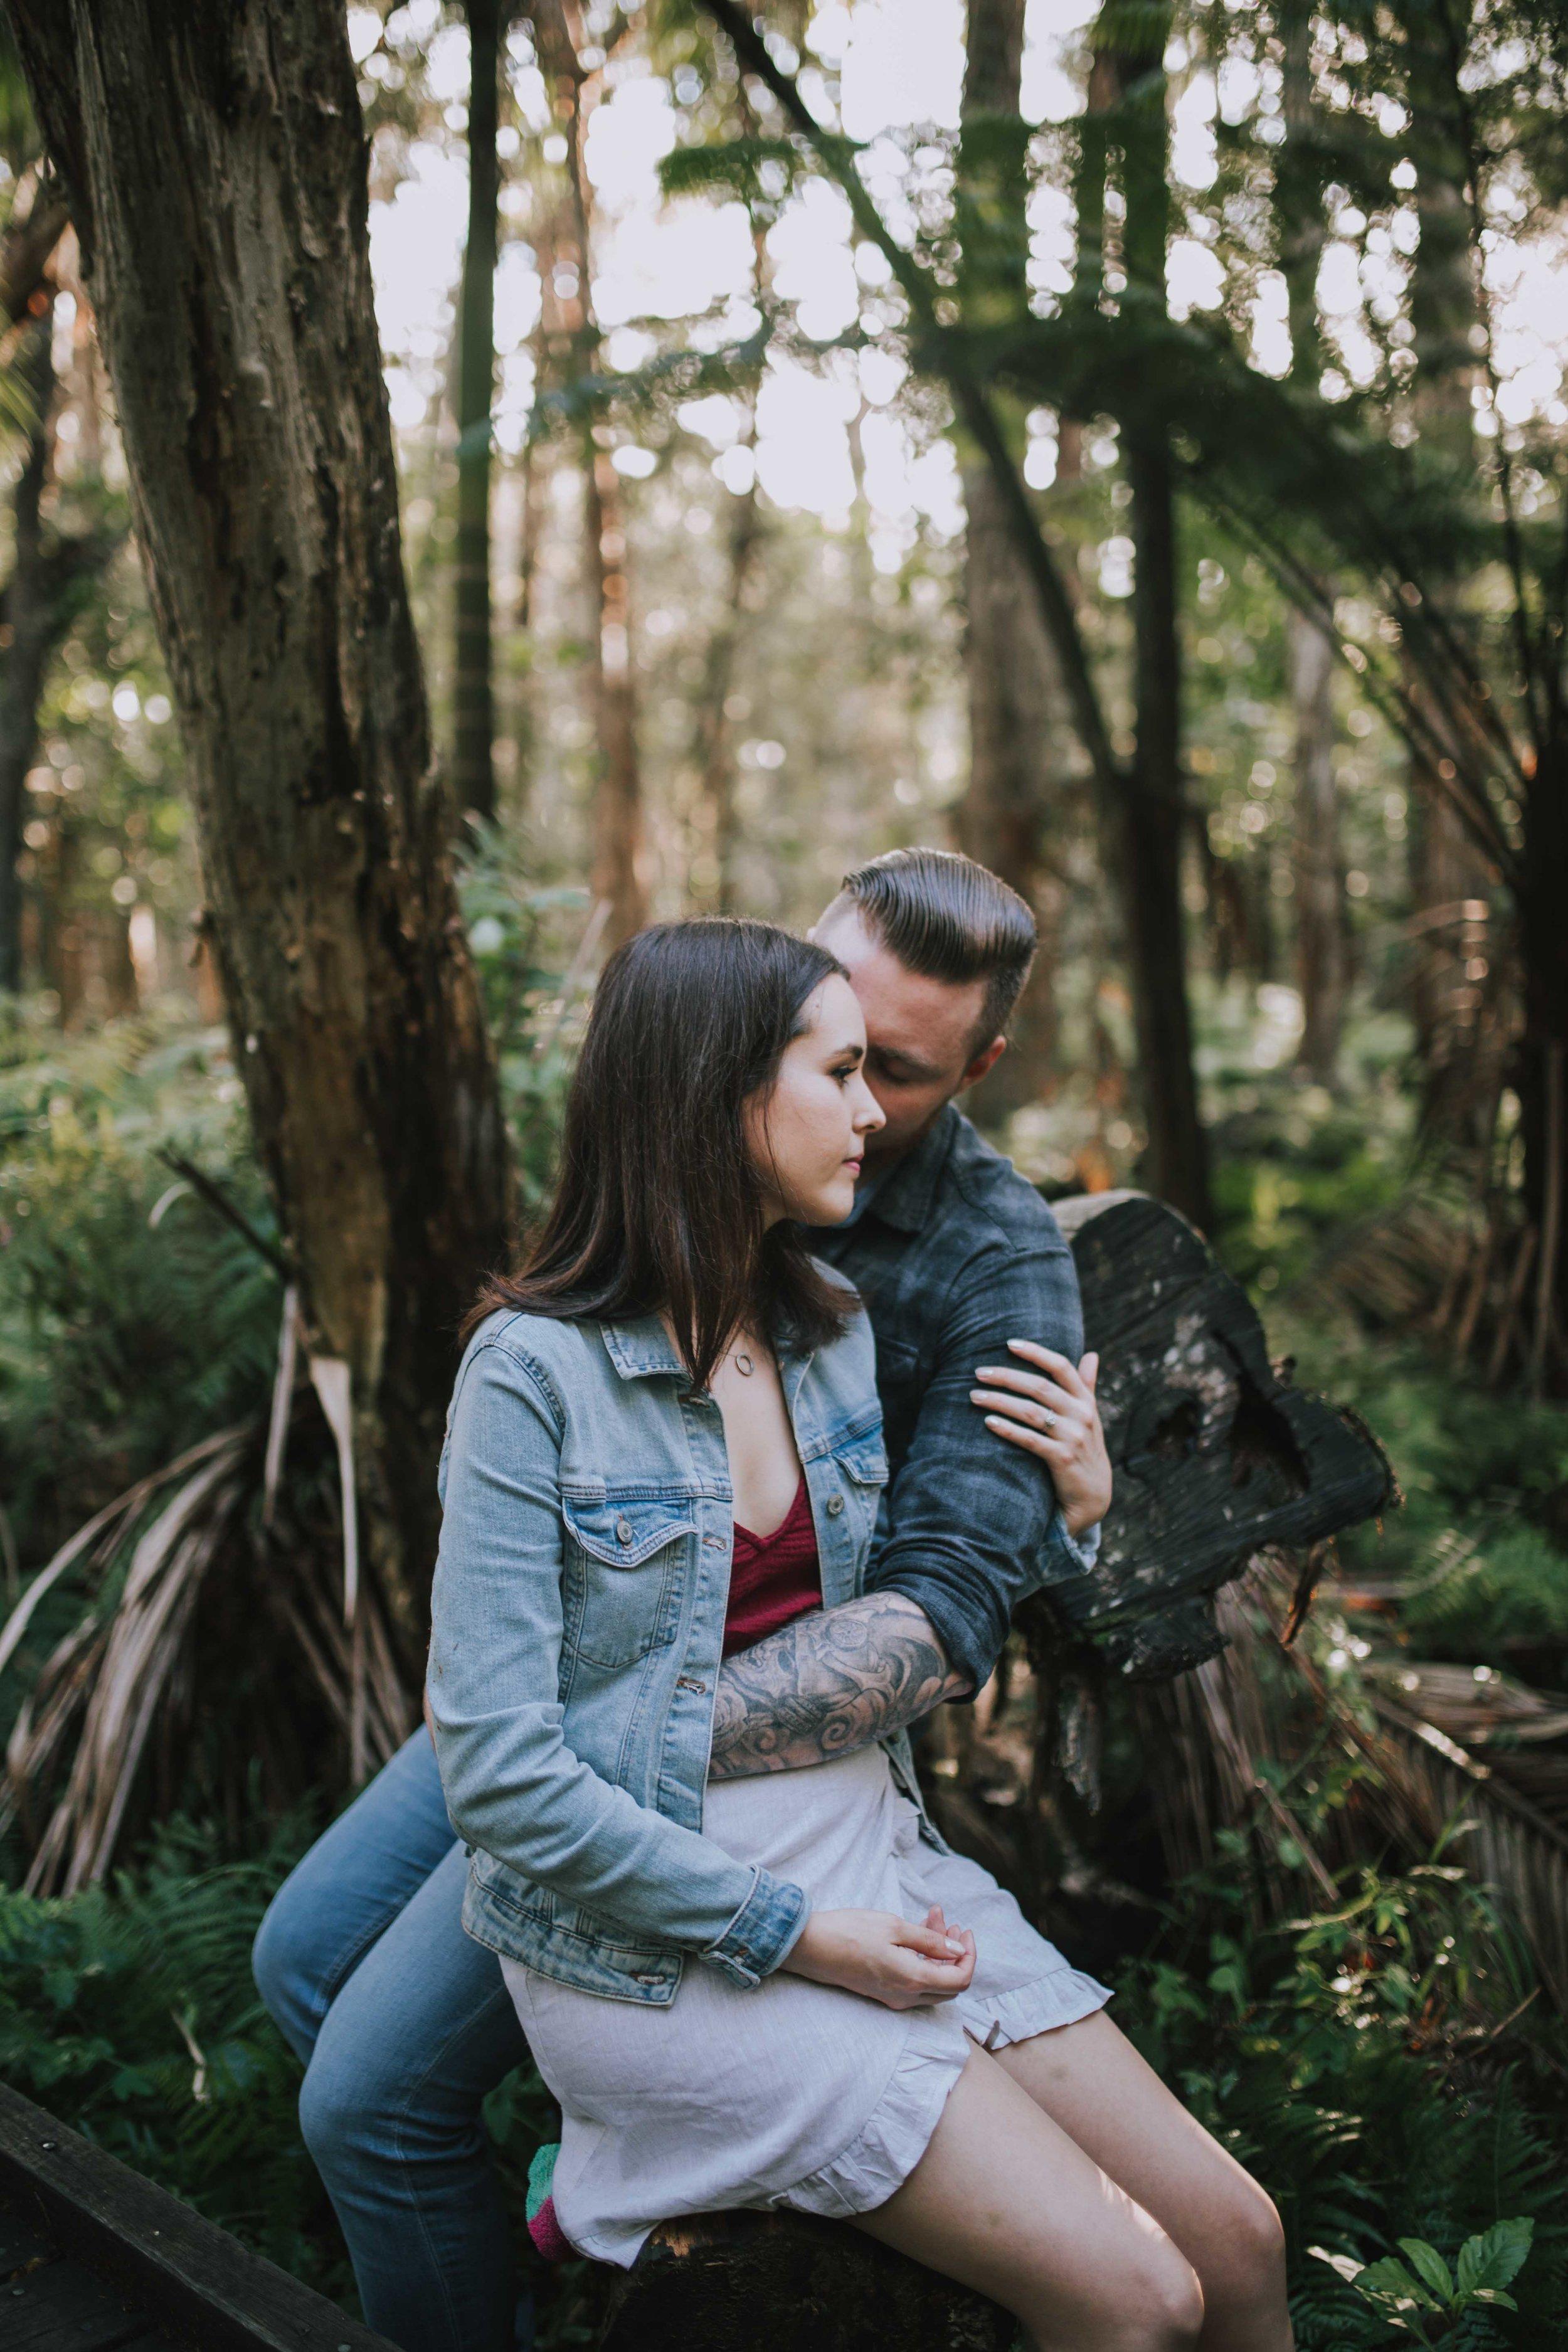 Brisbane Wedding Photographer.Engagements (15 of 22).jpg